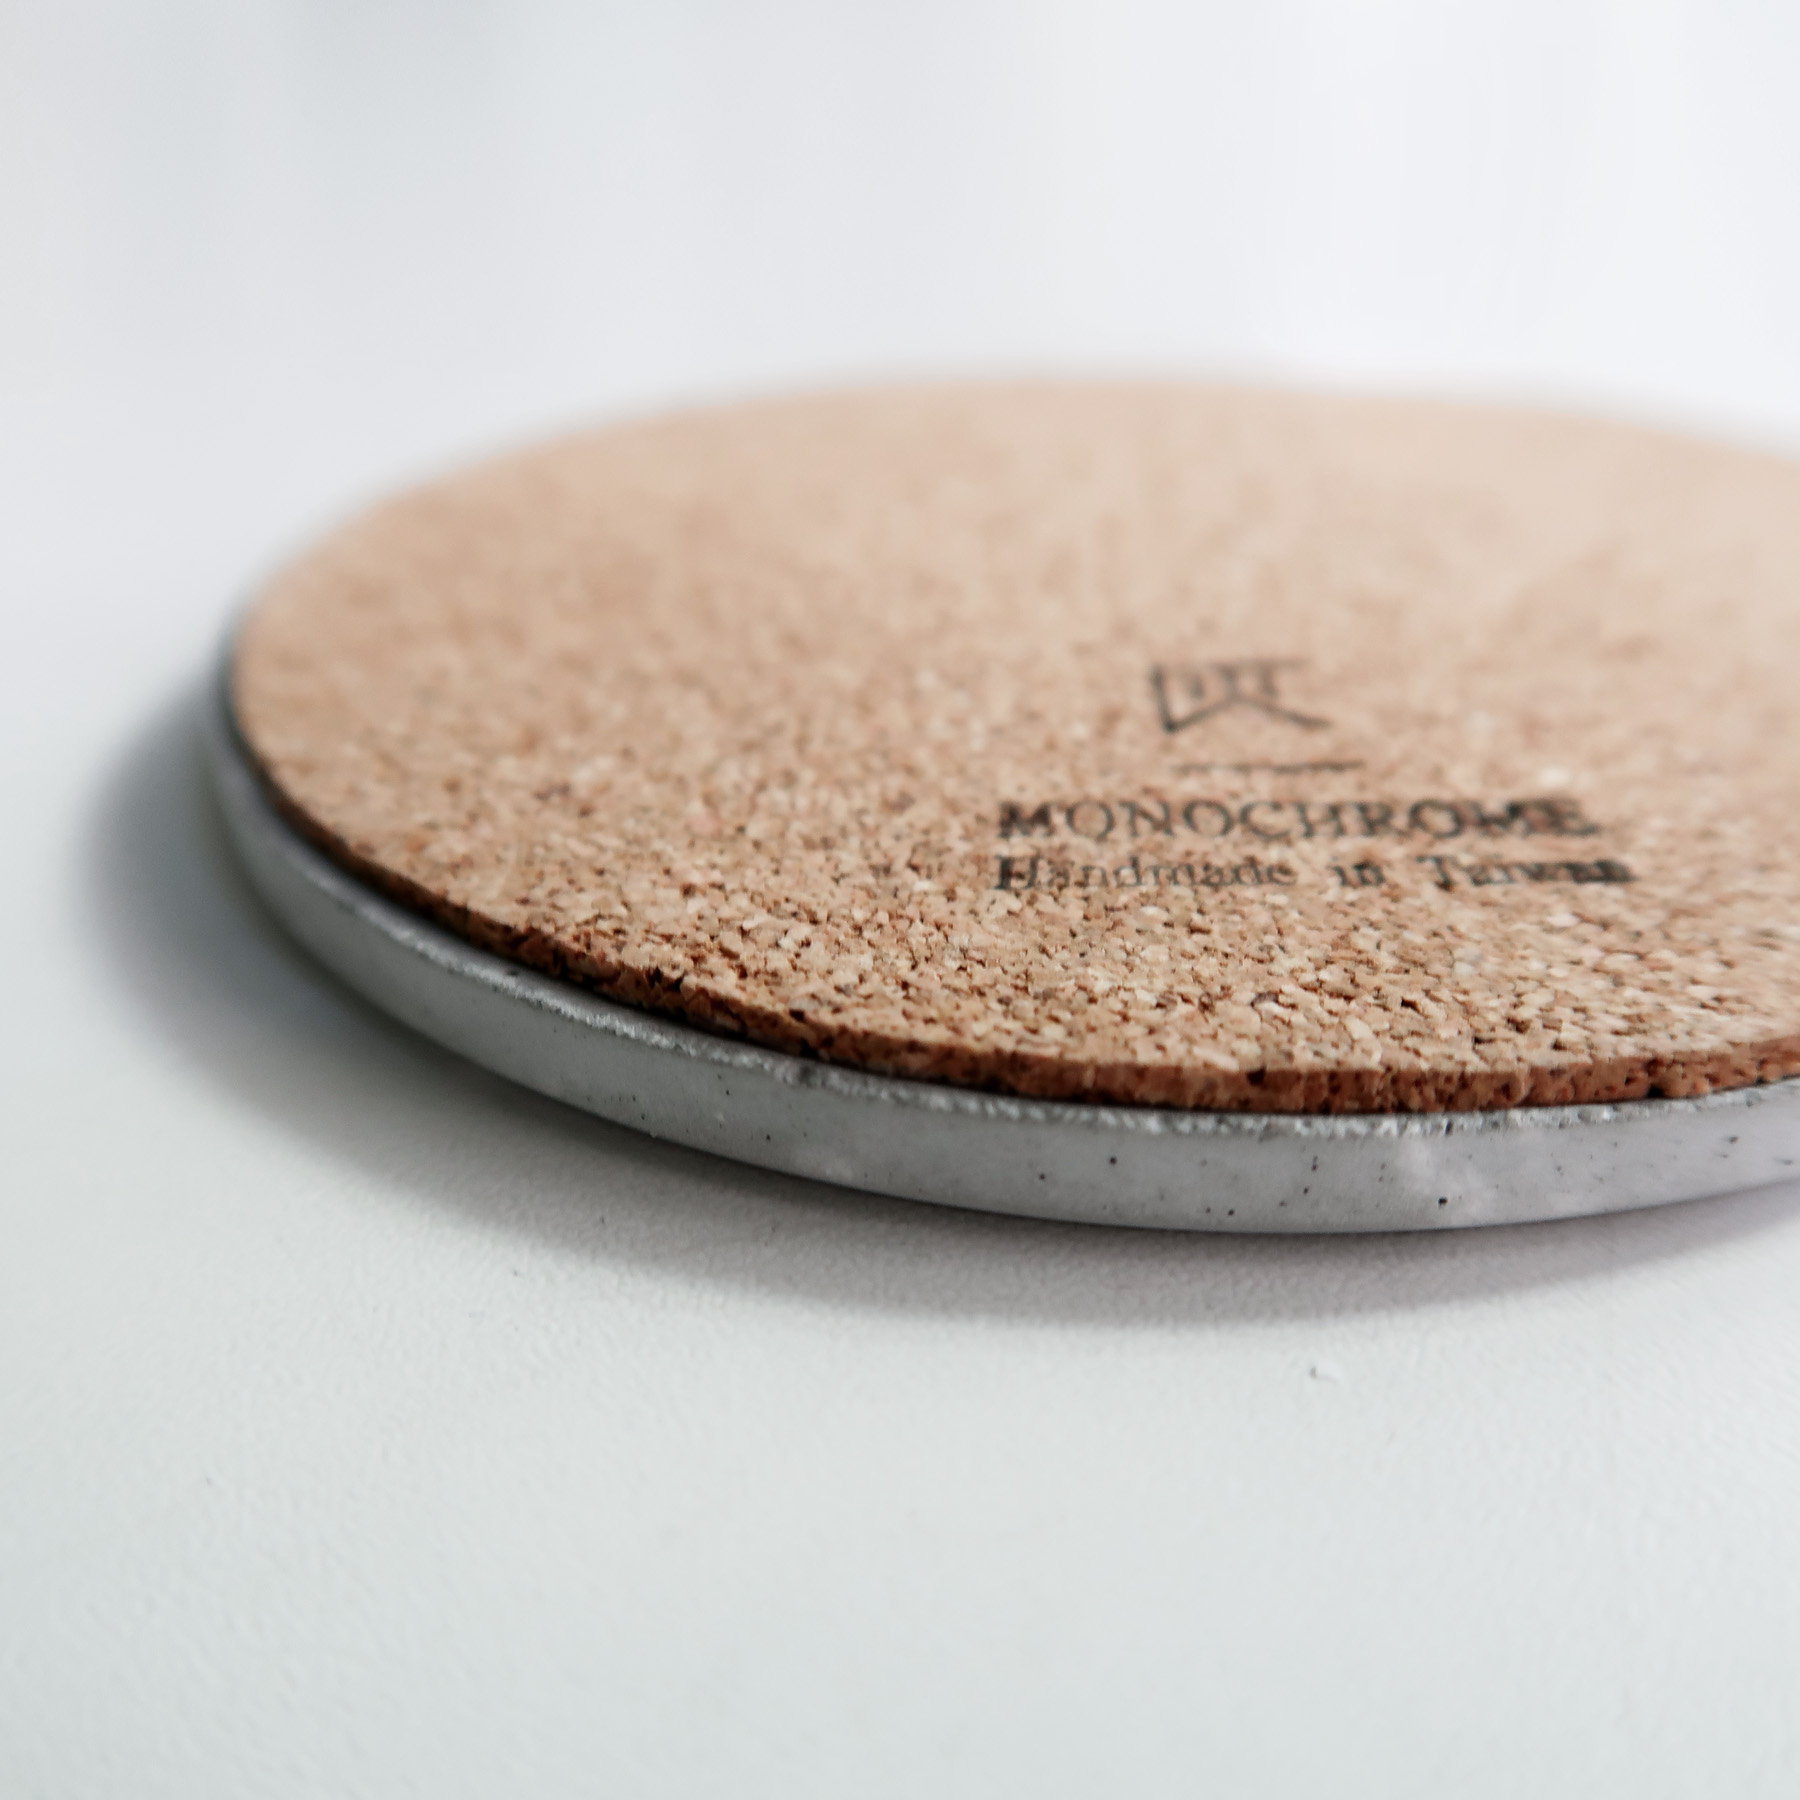 Concrete Design 大氣層灰白紋理水泥吸水圓墊・杯墊・飾品盤 - 軟木底墊